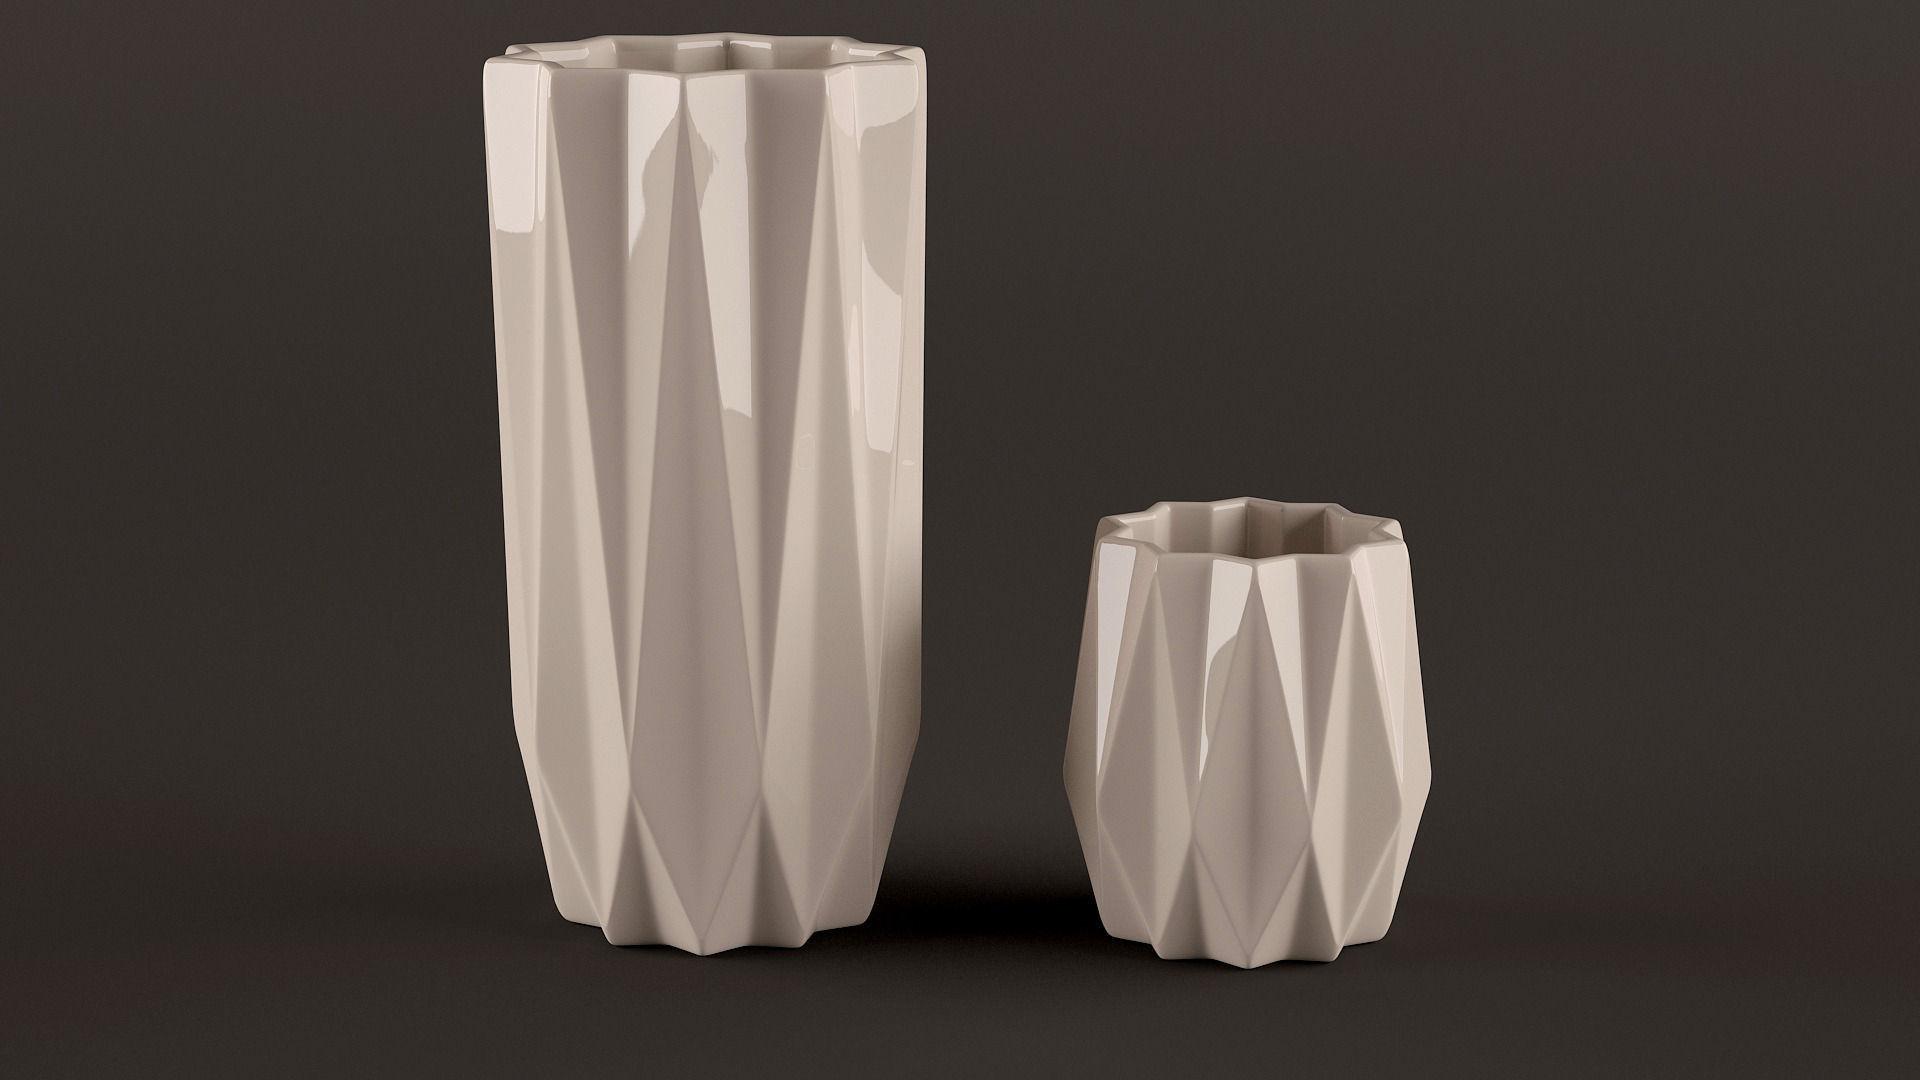 Origami Vases 3d Model Max Obj Fbx Mtl Unitypackage 6